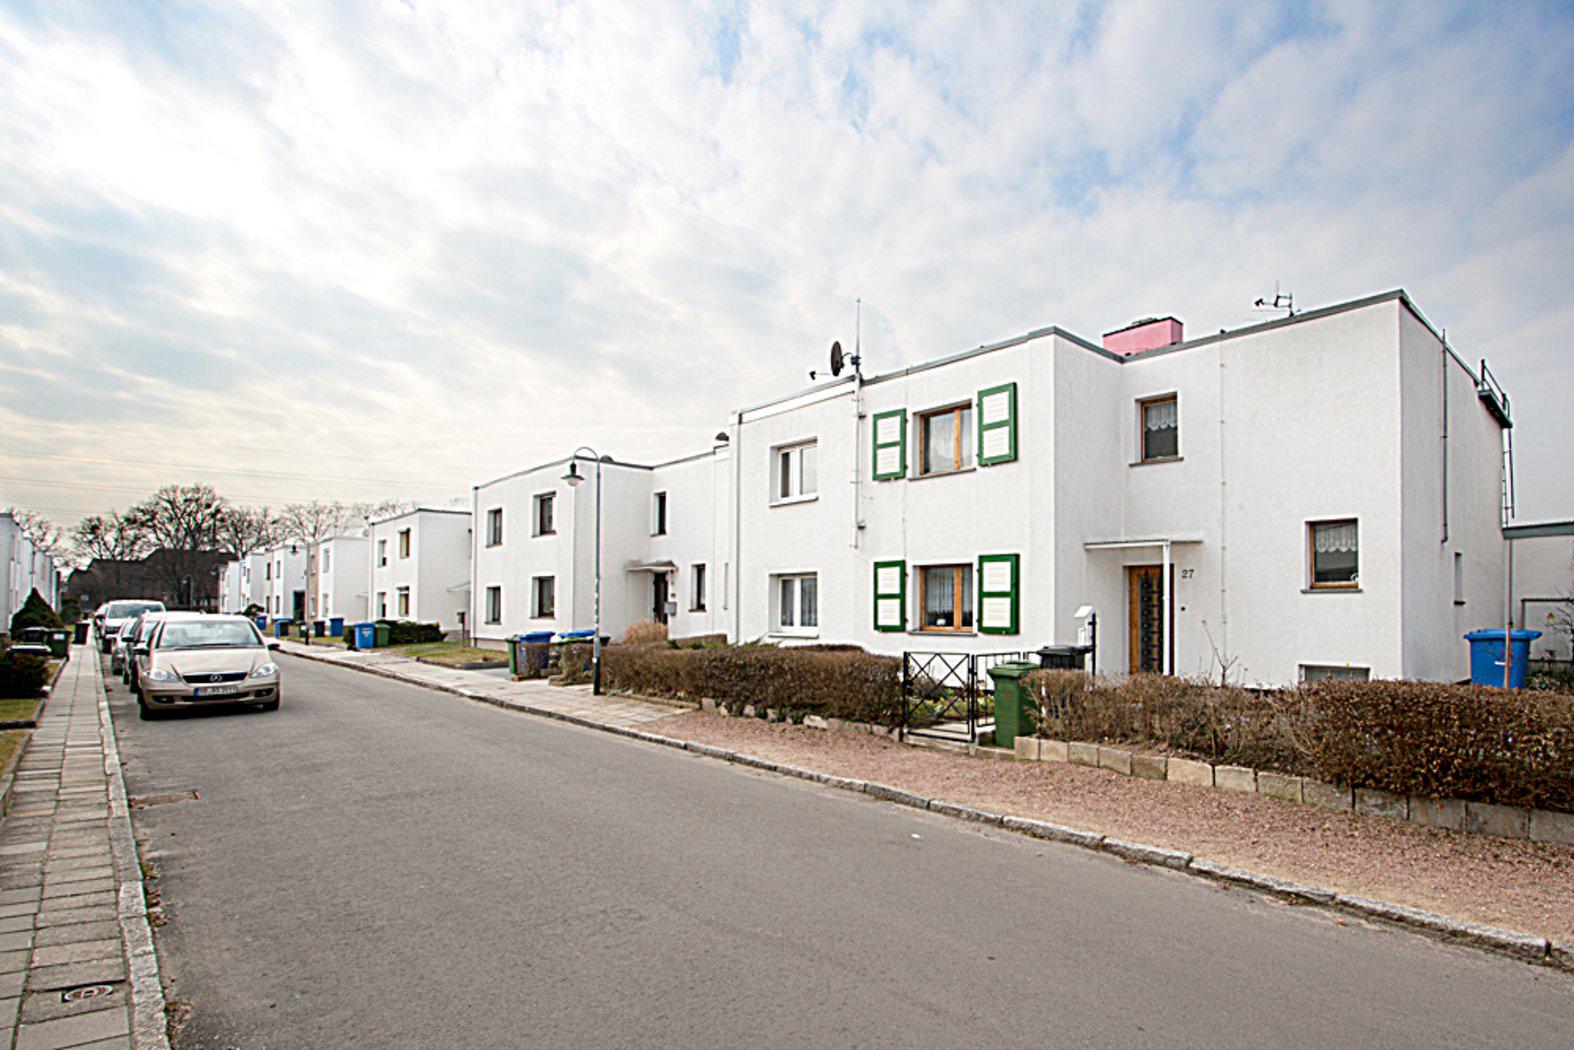 Where to experience the Bauhaus in 2019: Dessau Törten